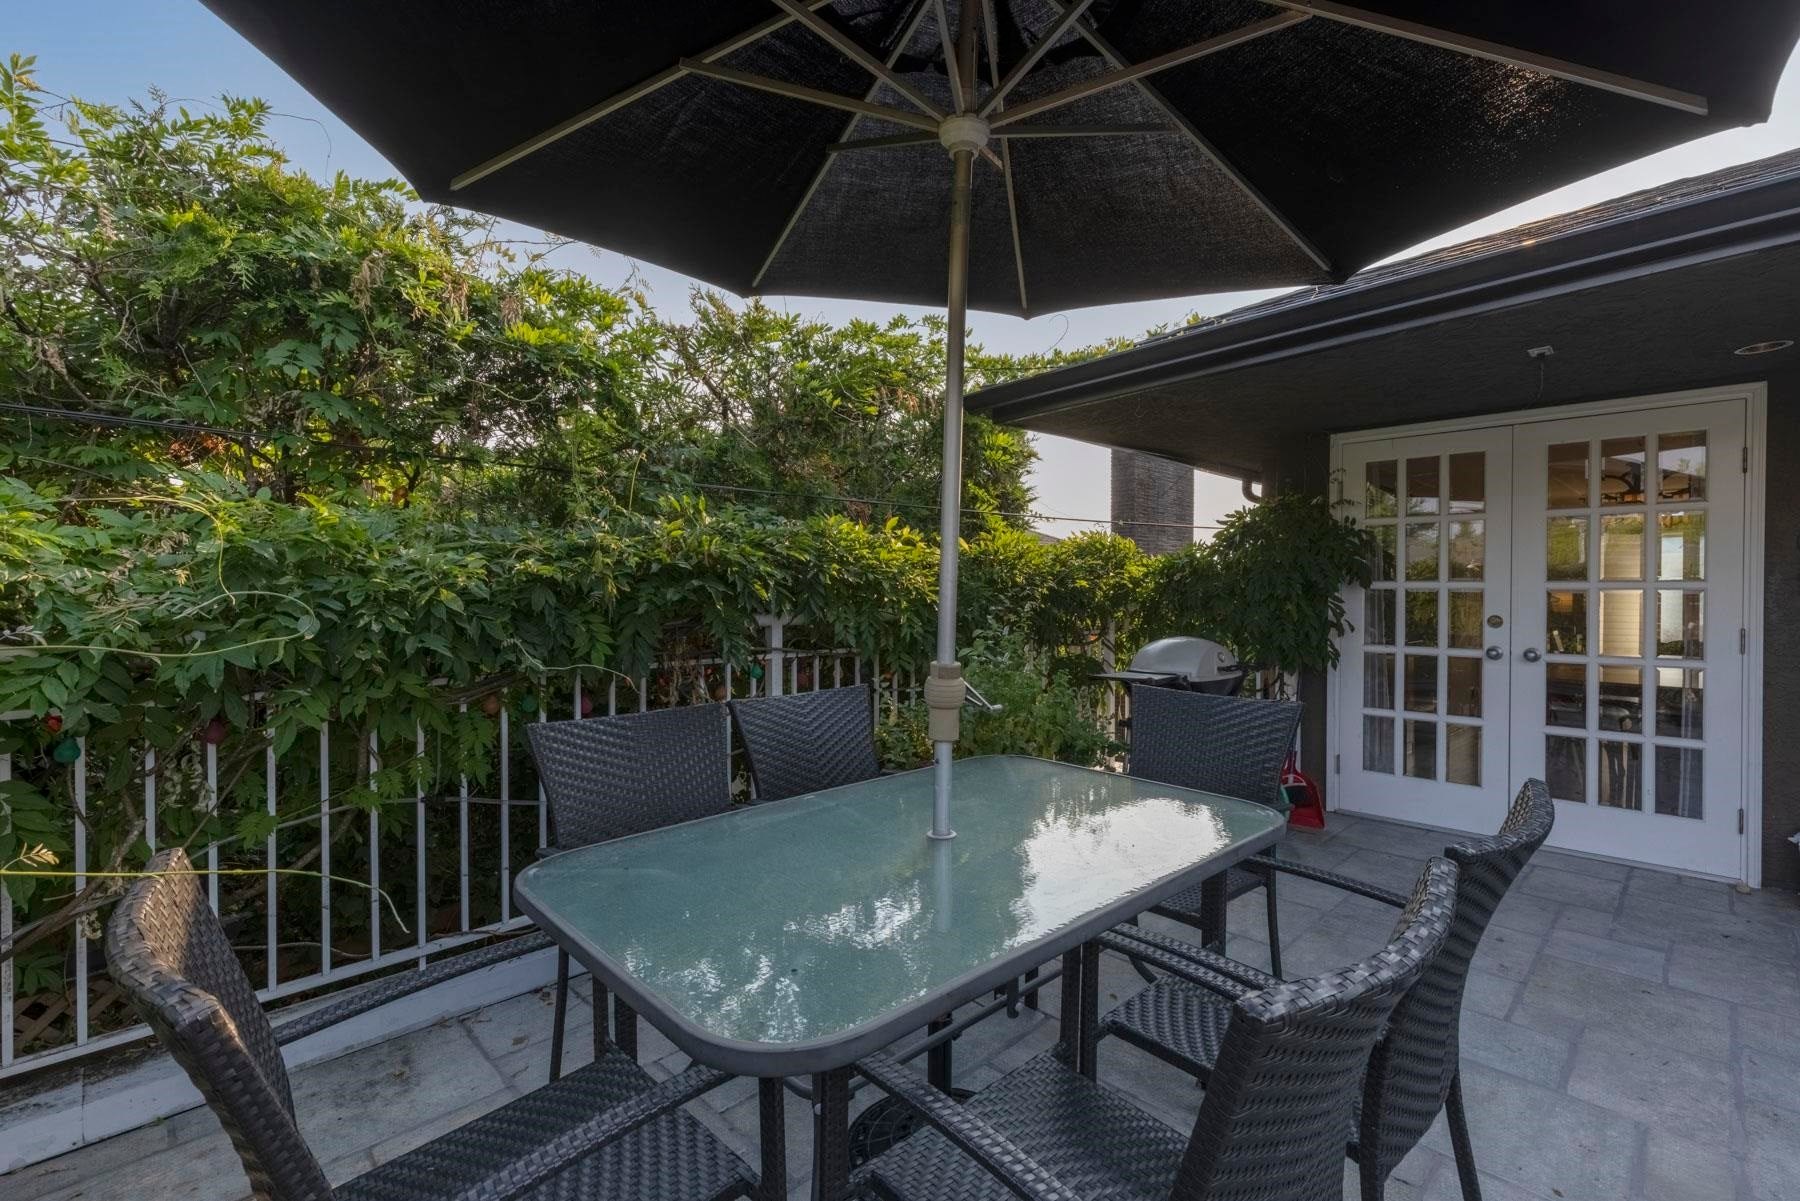 1036 GRAND BOULEVARD - Boulevard House/Single Family for sale, 5 Bedrooms (R2616987) - #30